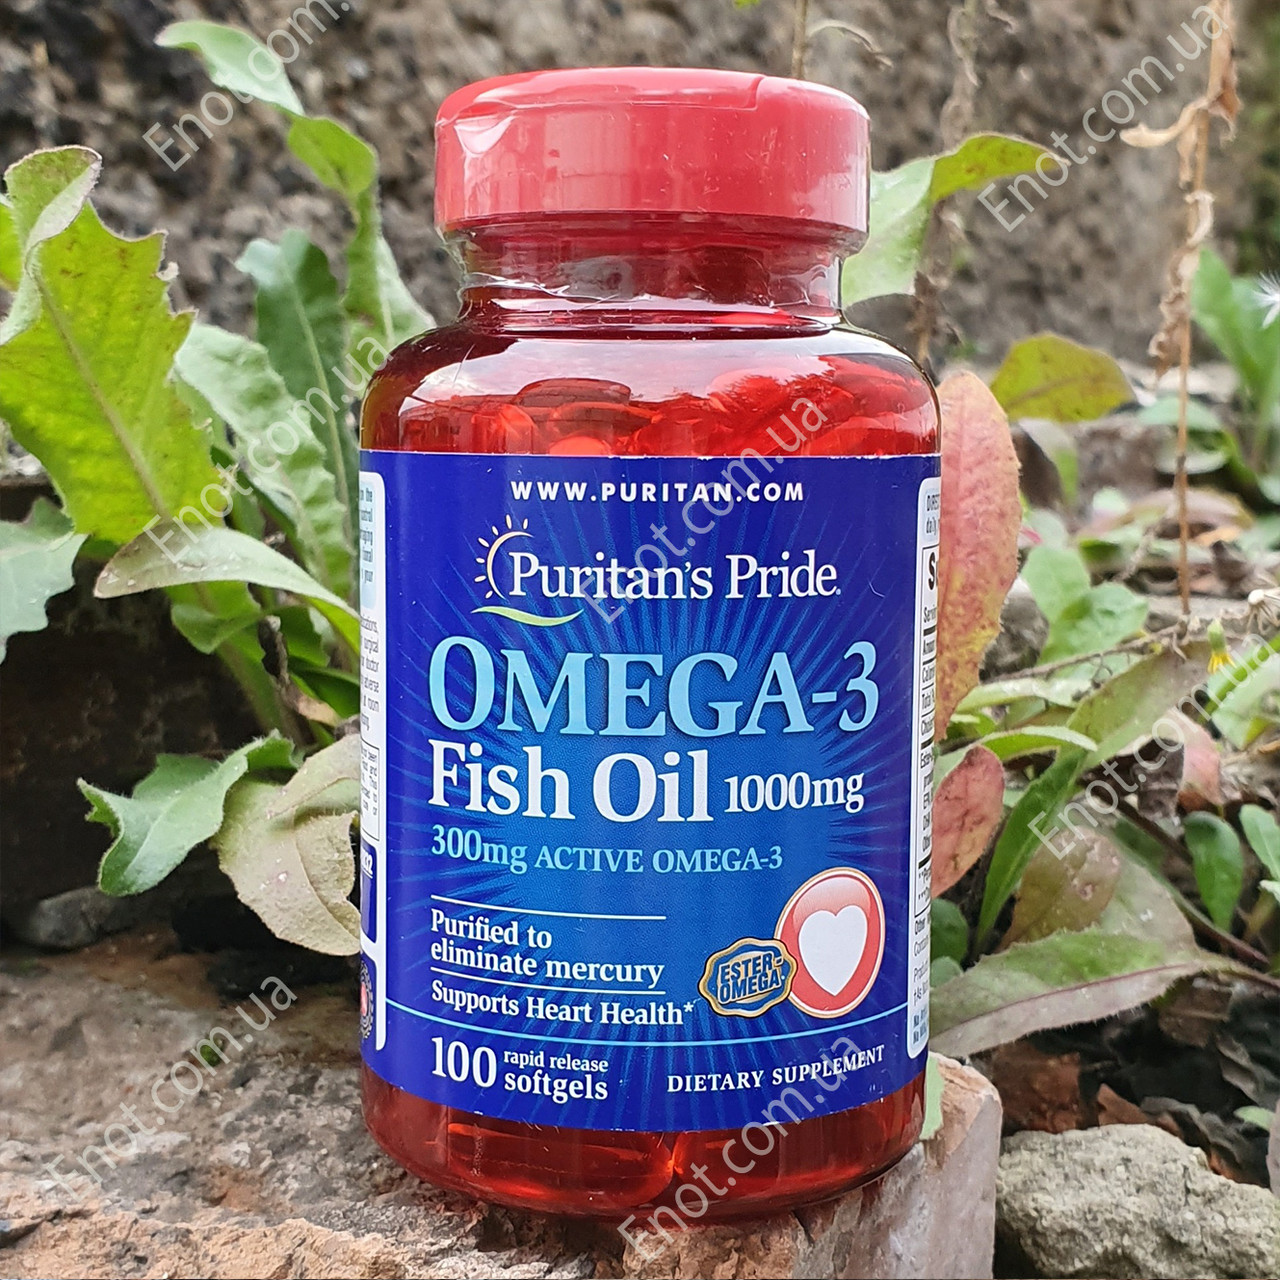 Рыбий жир Puritan's Pride Omega-3 Fish Oil 1000 мг (300 мг Active Omega-3) 100 гелевых капсул